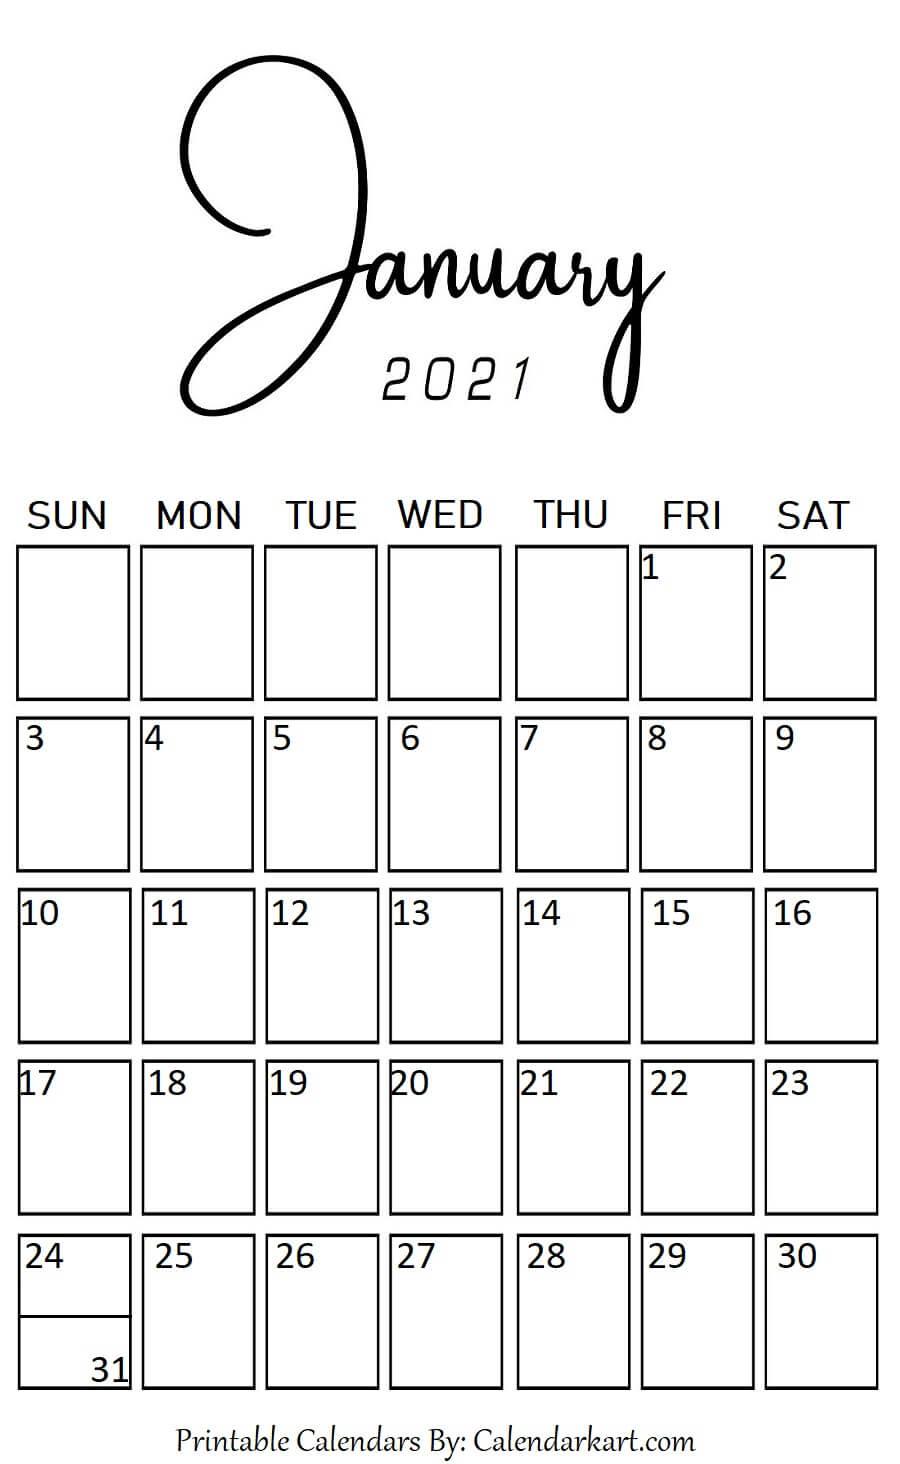 January 2021 Portrait (Vertical) Style Calendar   Calendar